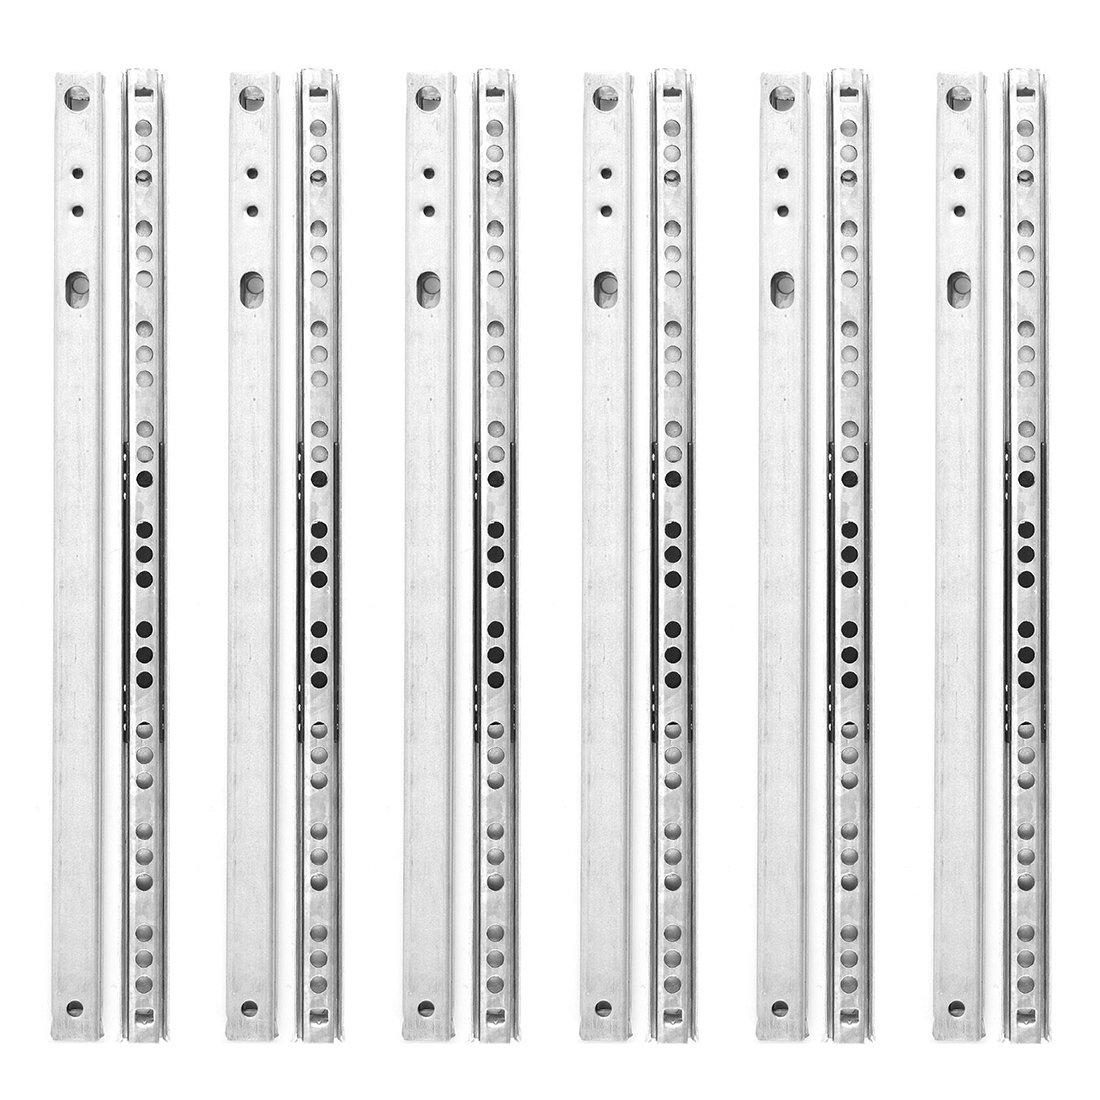 SODIAL 6 Pairs Metal Ball Bearing Drawer runner Pr 310mm draw depth for 17mm R